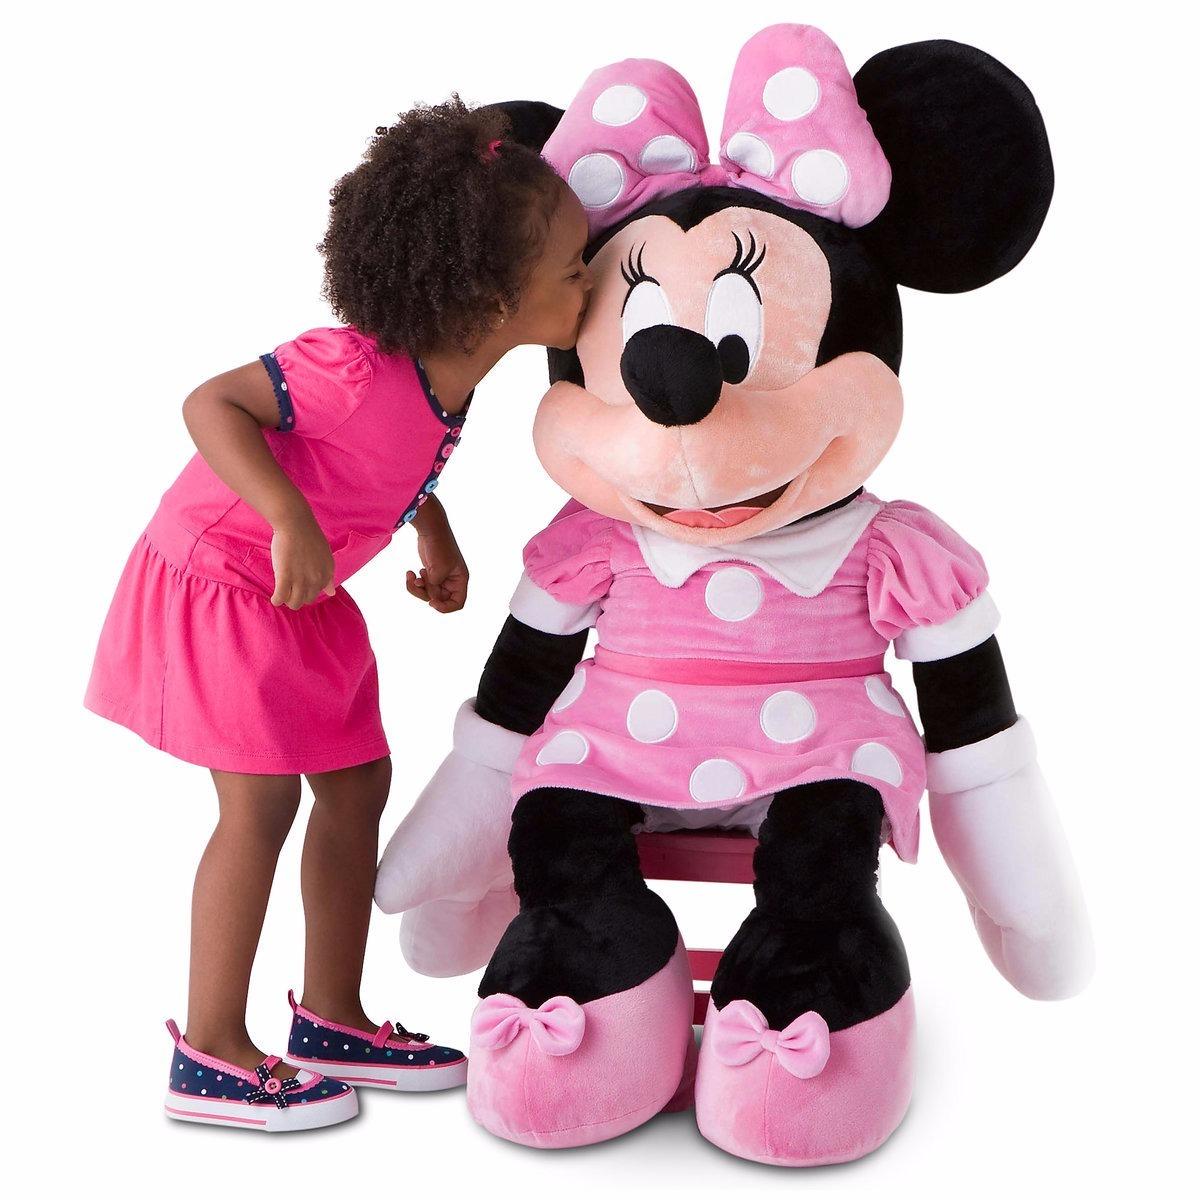 minnie mouse peluche gigante minnie mouse original disney en mercado libre. Black Bedroom Furniture Sets. Home Design Ideas